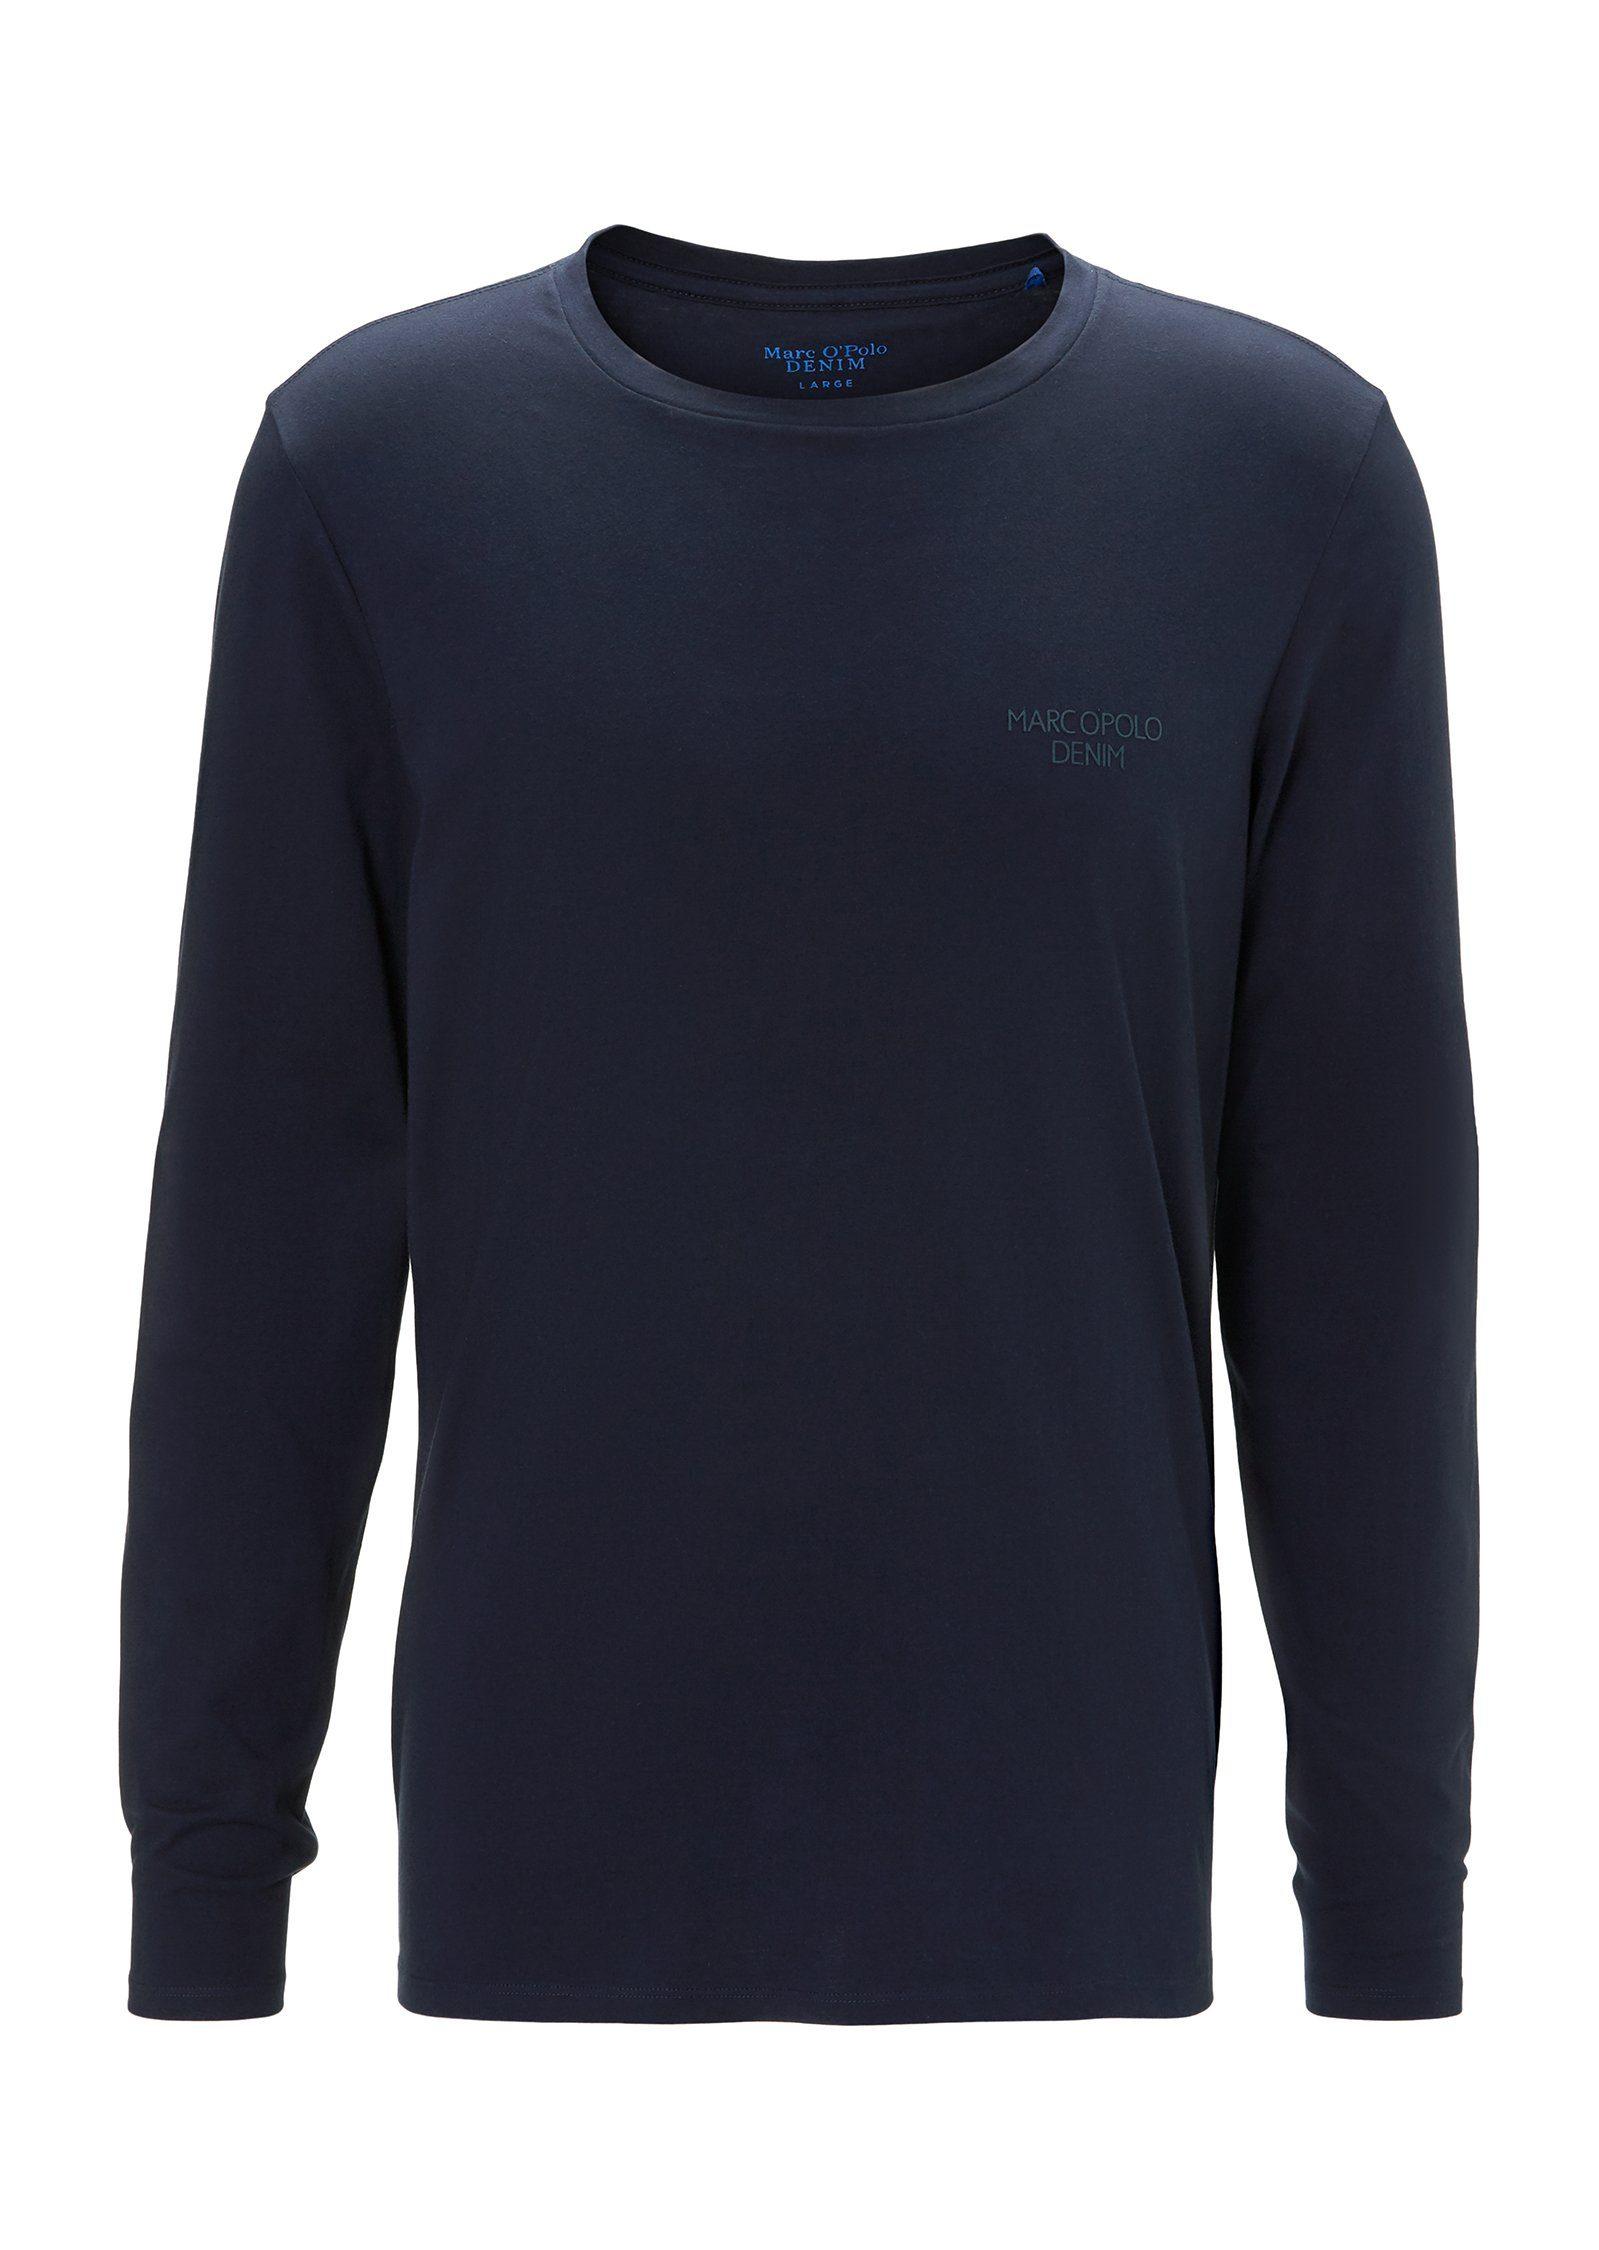 Denim Kaufen Marc Online O'polo Langarmshirt wP8nkNOXZ0